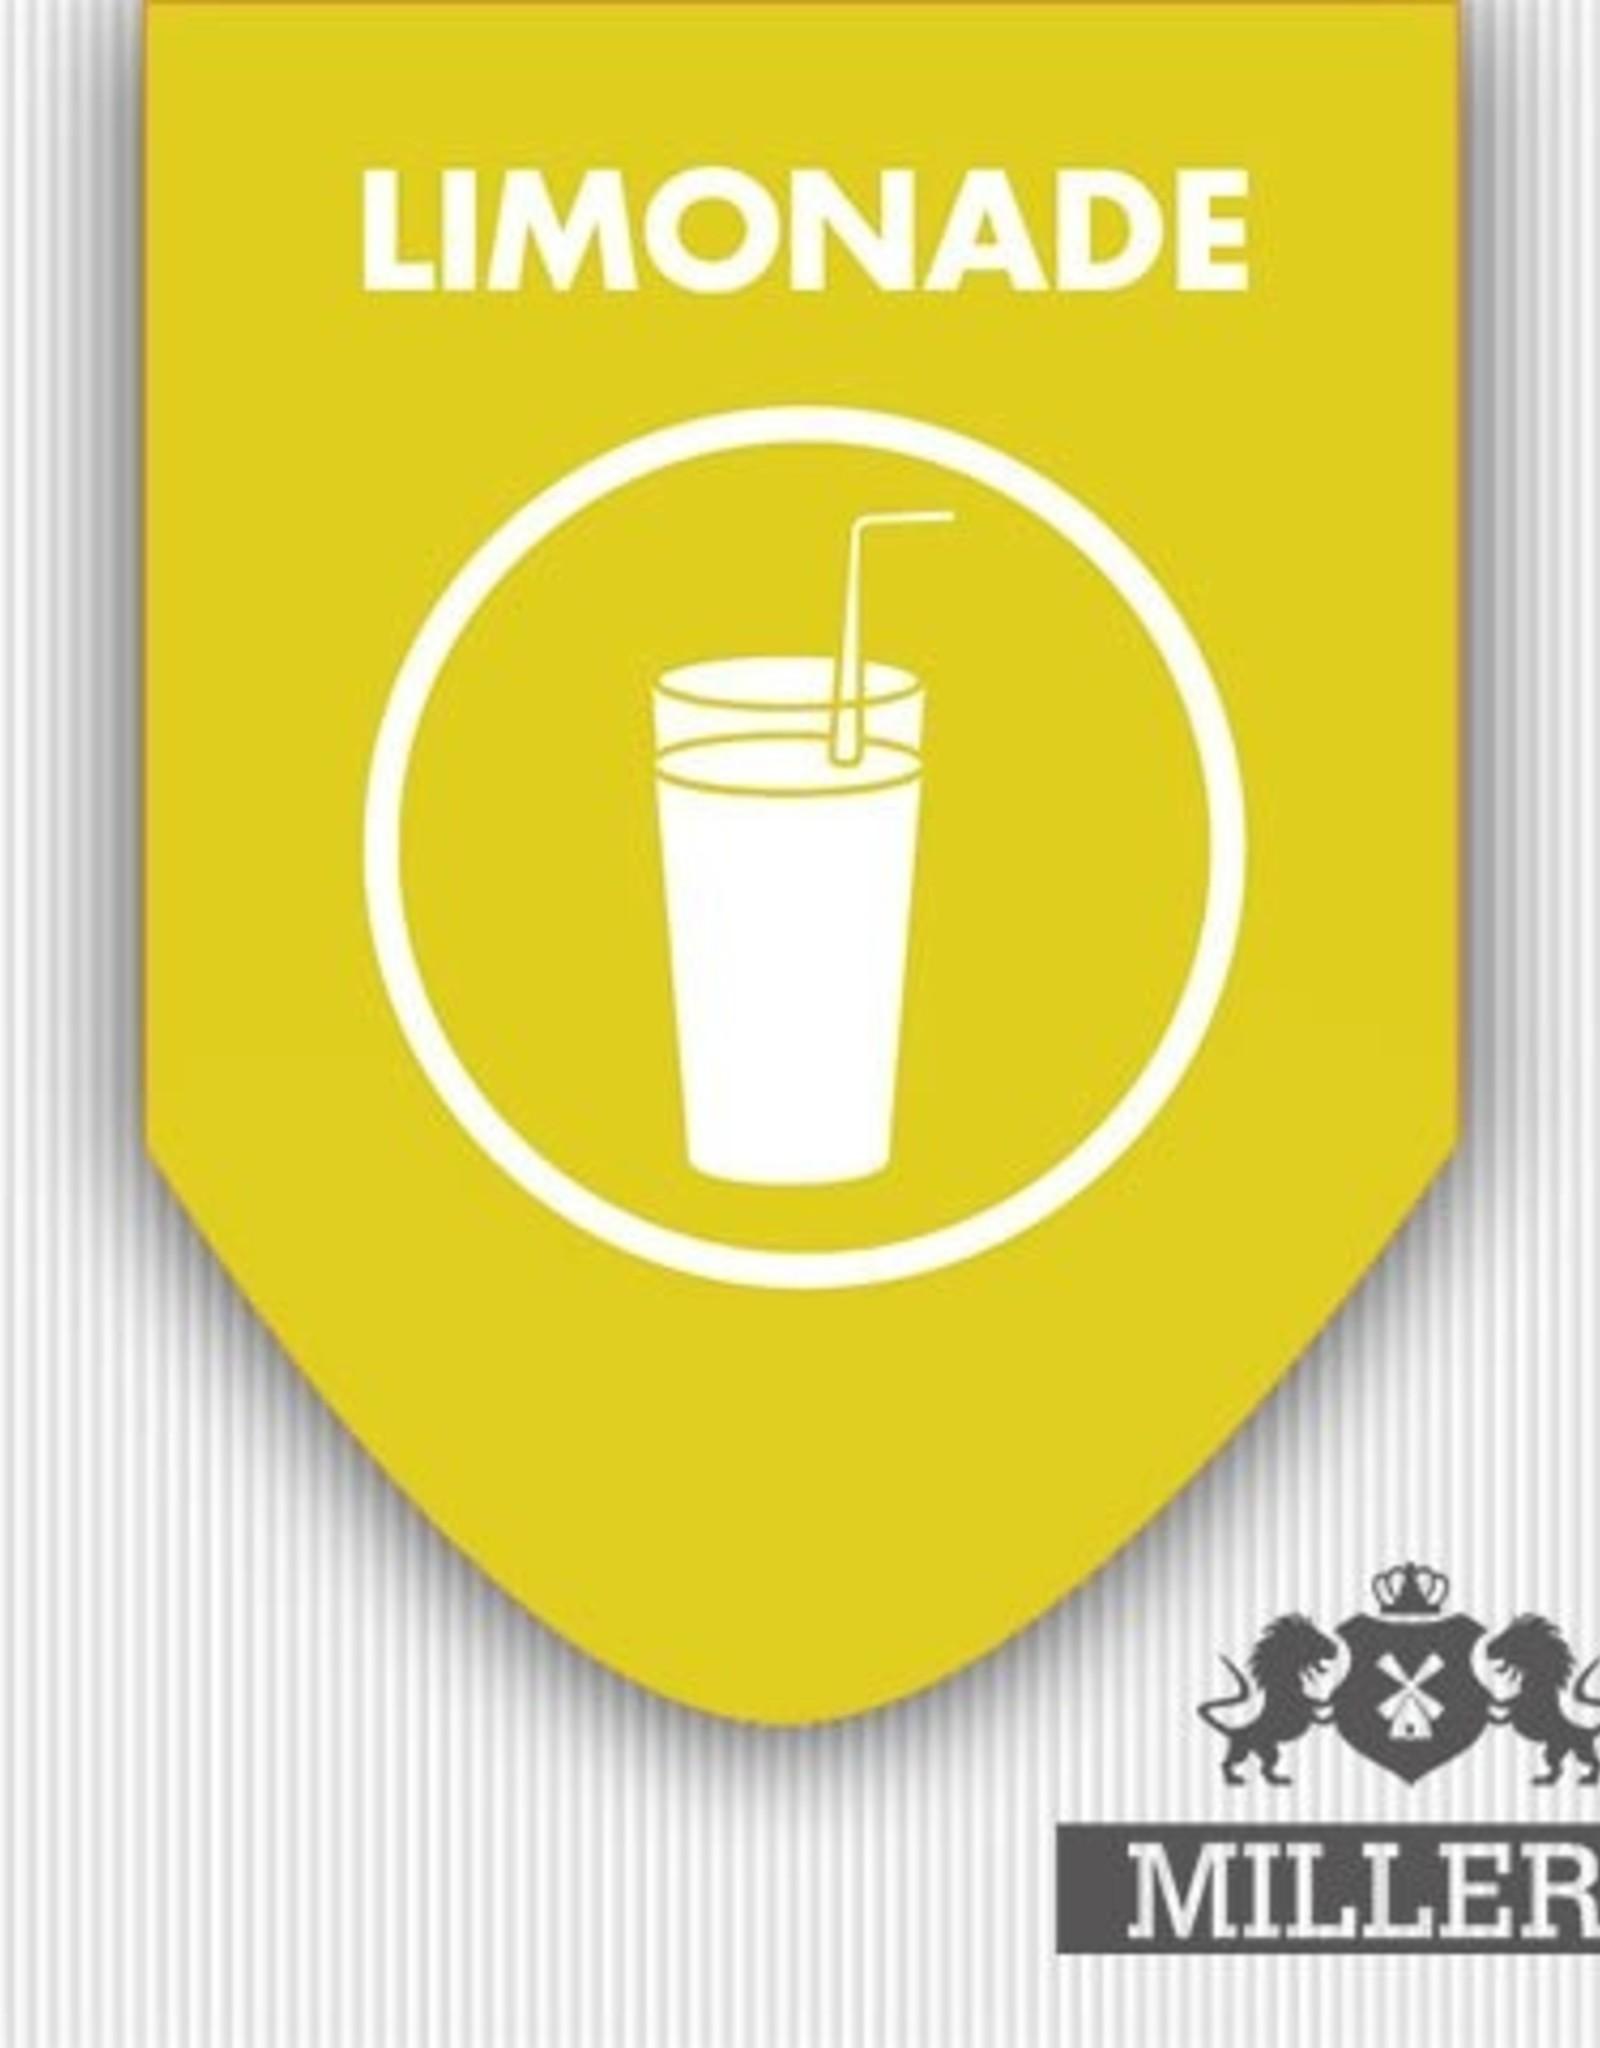 Millers Juice Miller Juice E-liquid Silverline 10 ml Limonade 12 mg